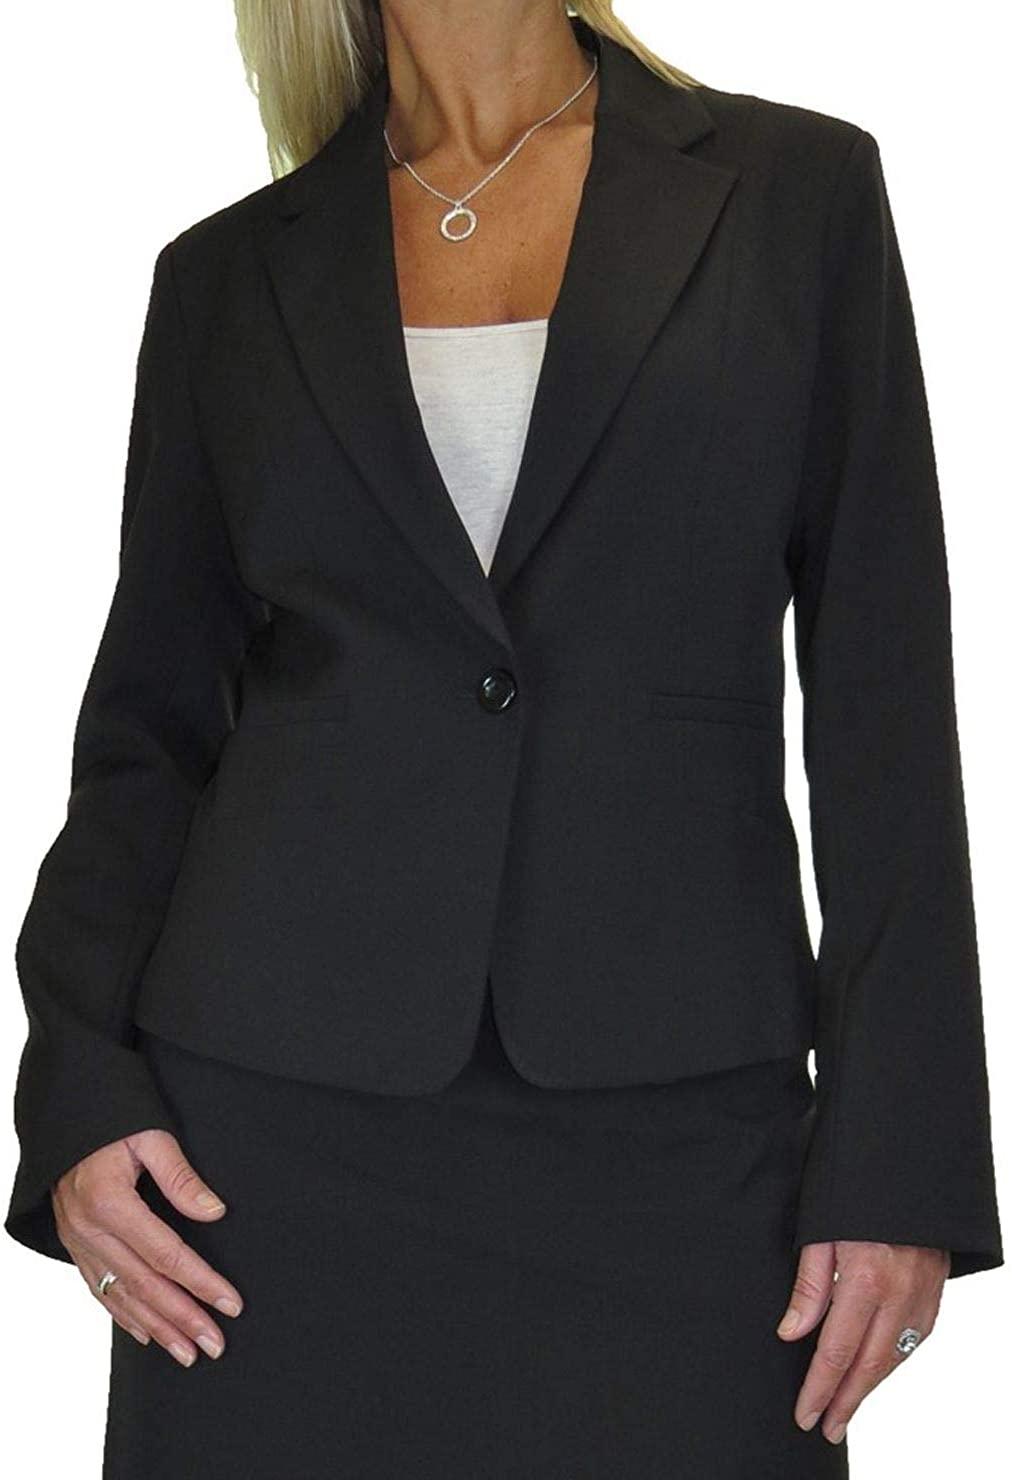 icecoolfashion Womens Jacket Fully Lined Washable Business Office Black 6-14